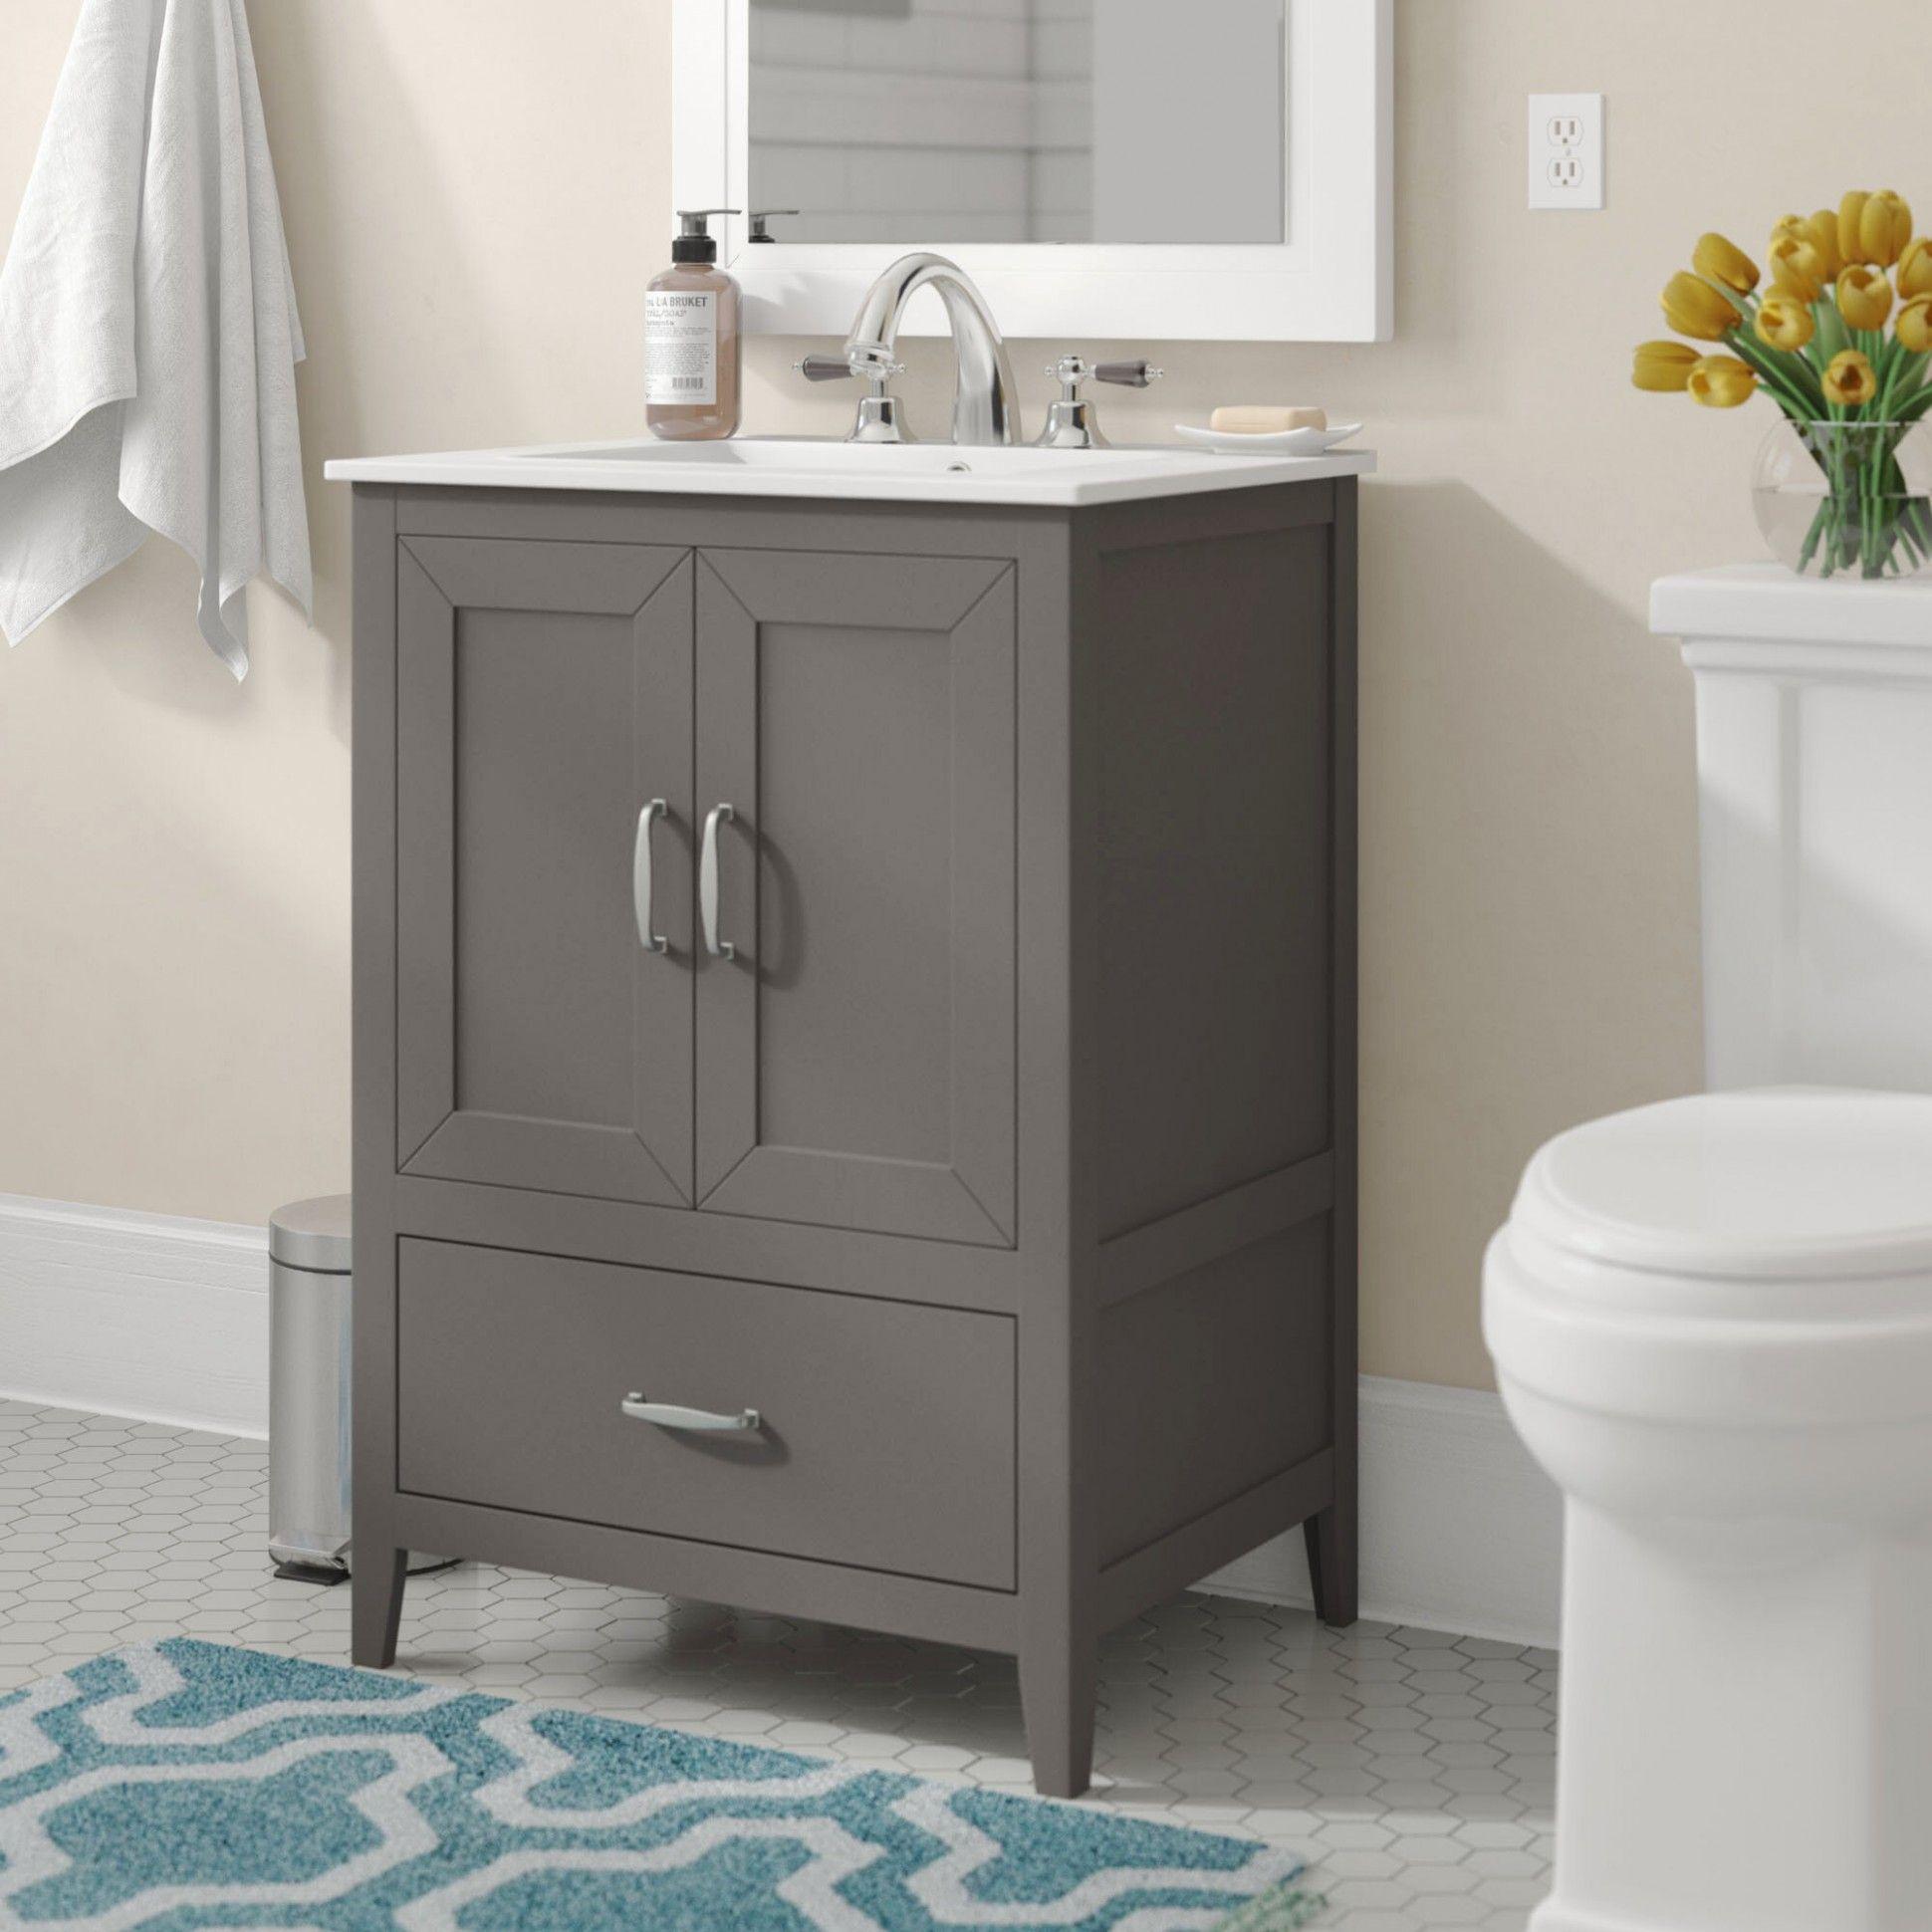 Wayfair Bathroom Pictures In 2020 Bathroom Vanity Double Vanity Bathroom Single Bathroom Vanity